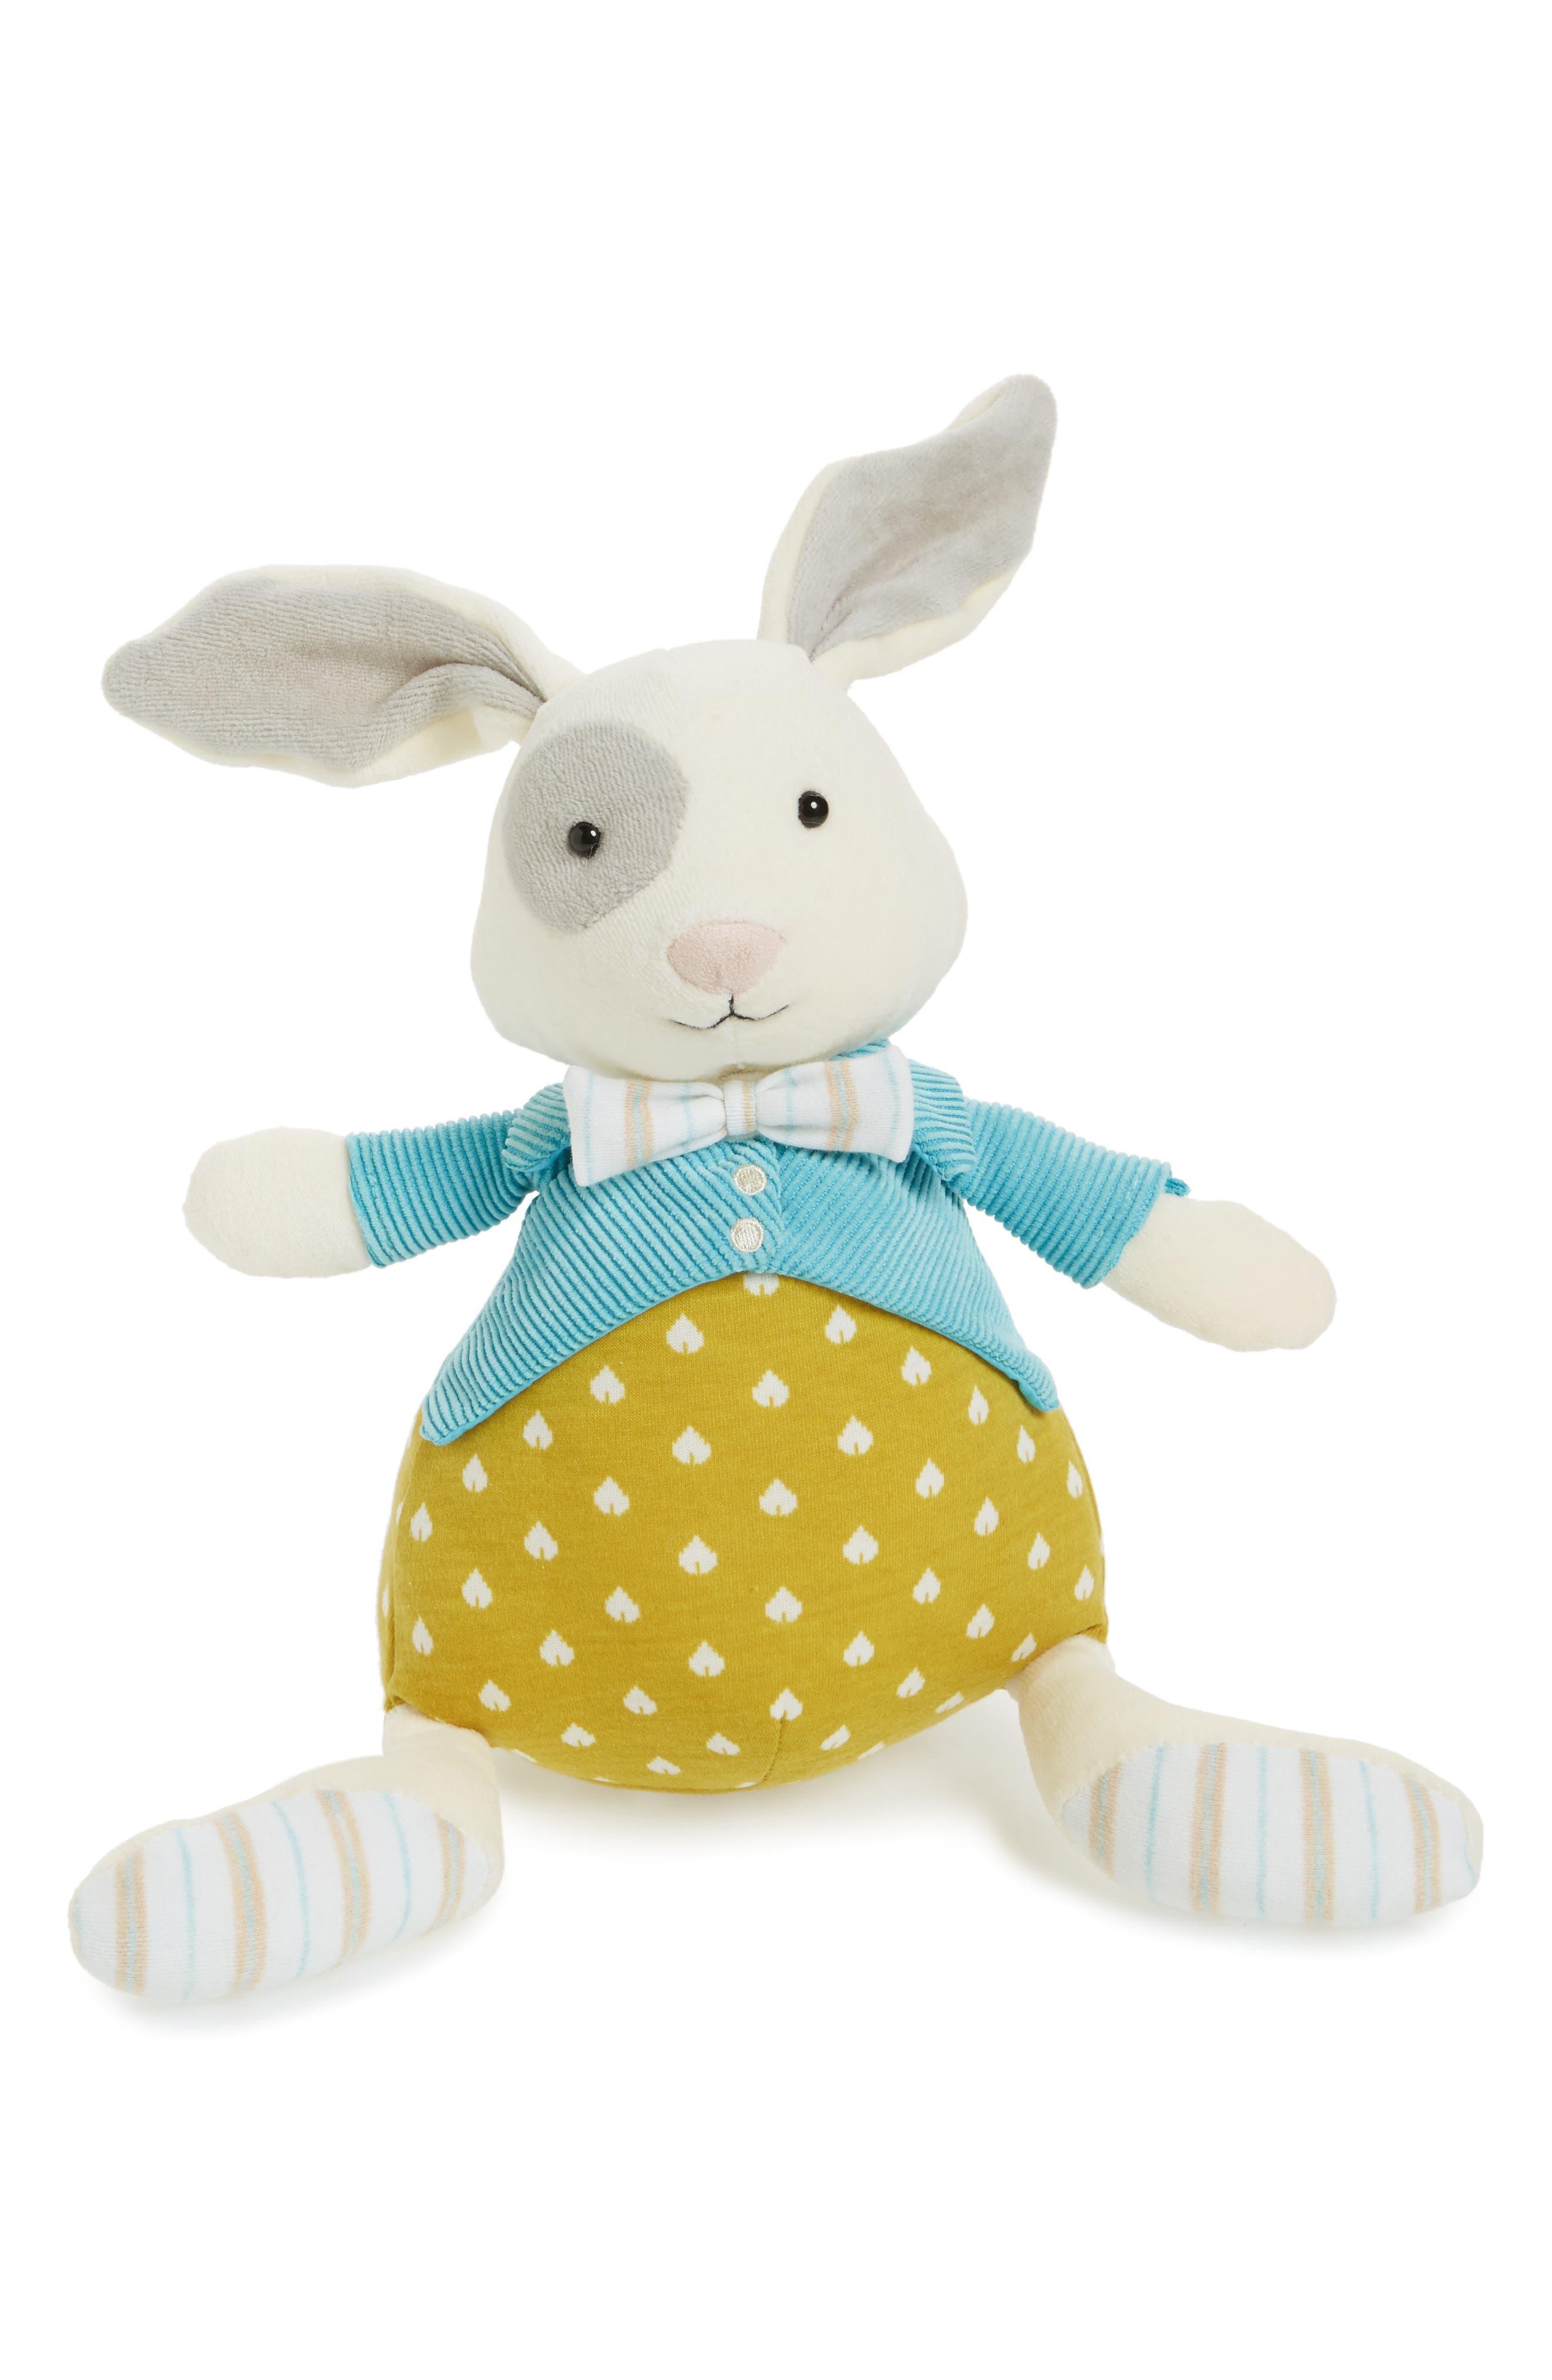 Lewis Rabbit Stuffed Animal,                             Main thumbnail 1, color,                             300